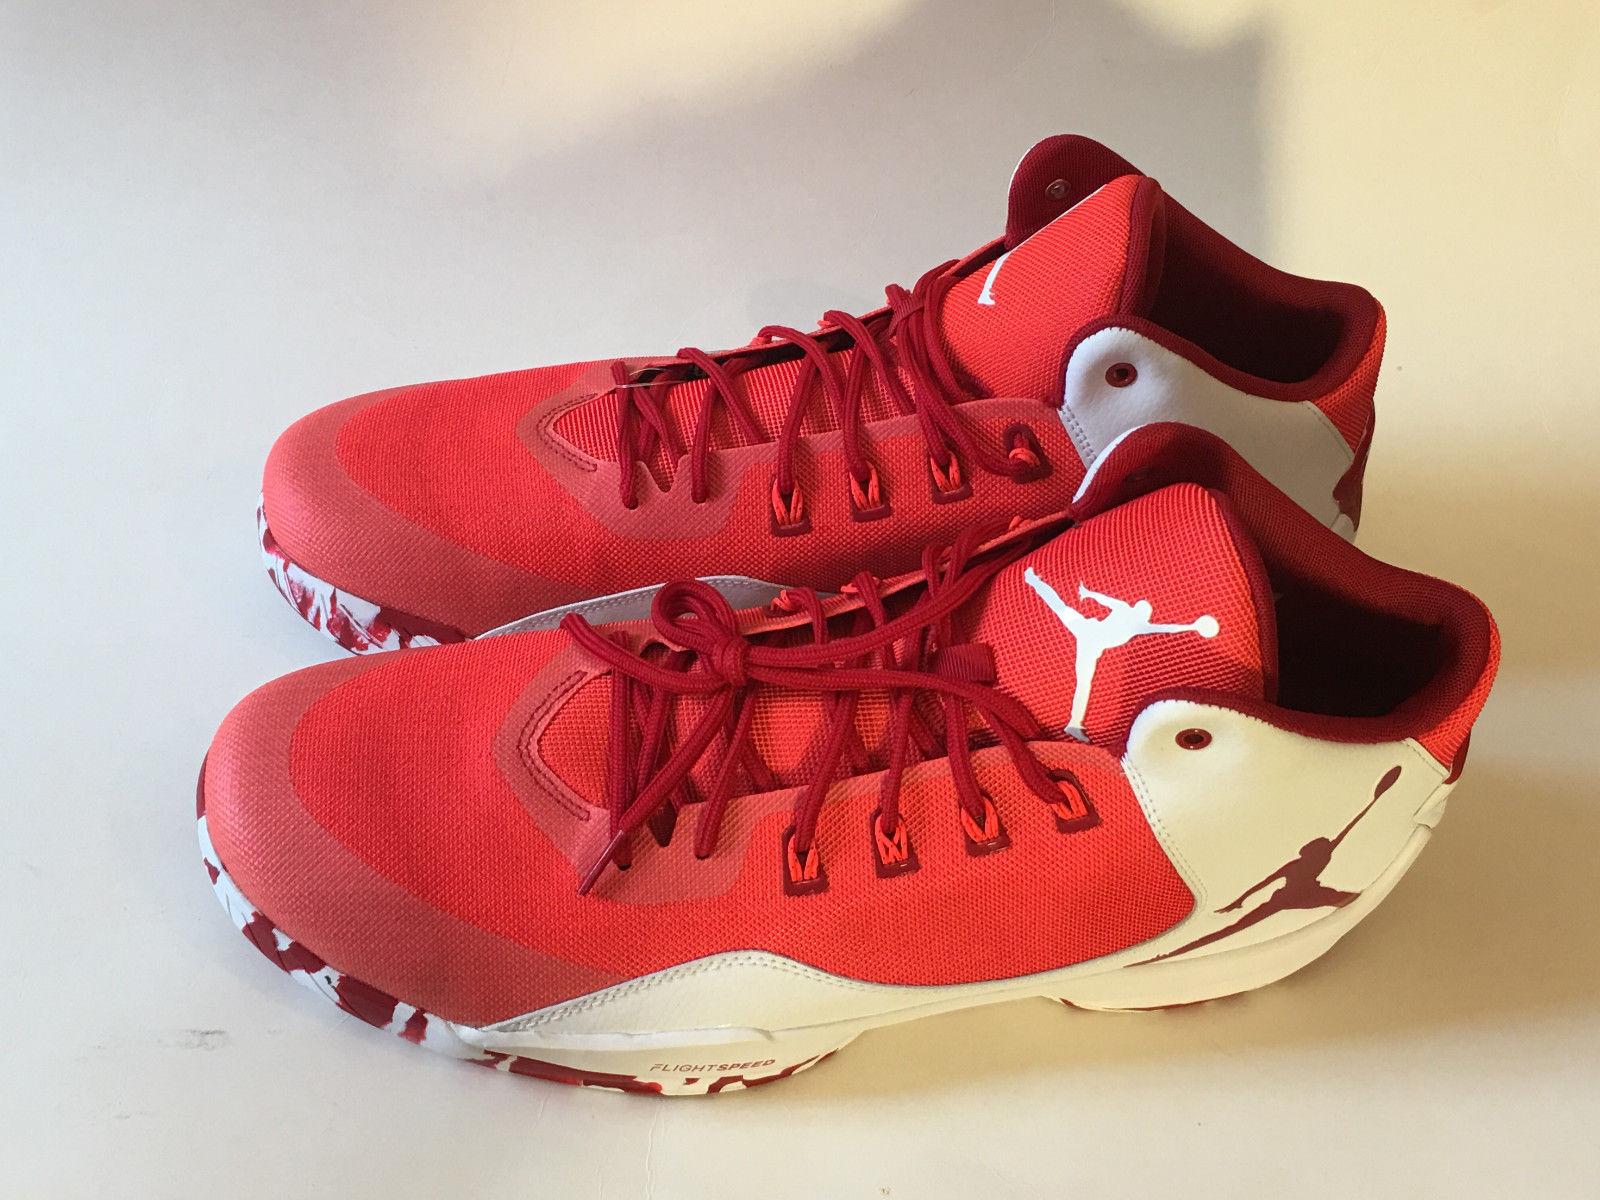 jordan shoes 844066 010 editor portable generators 798226